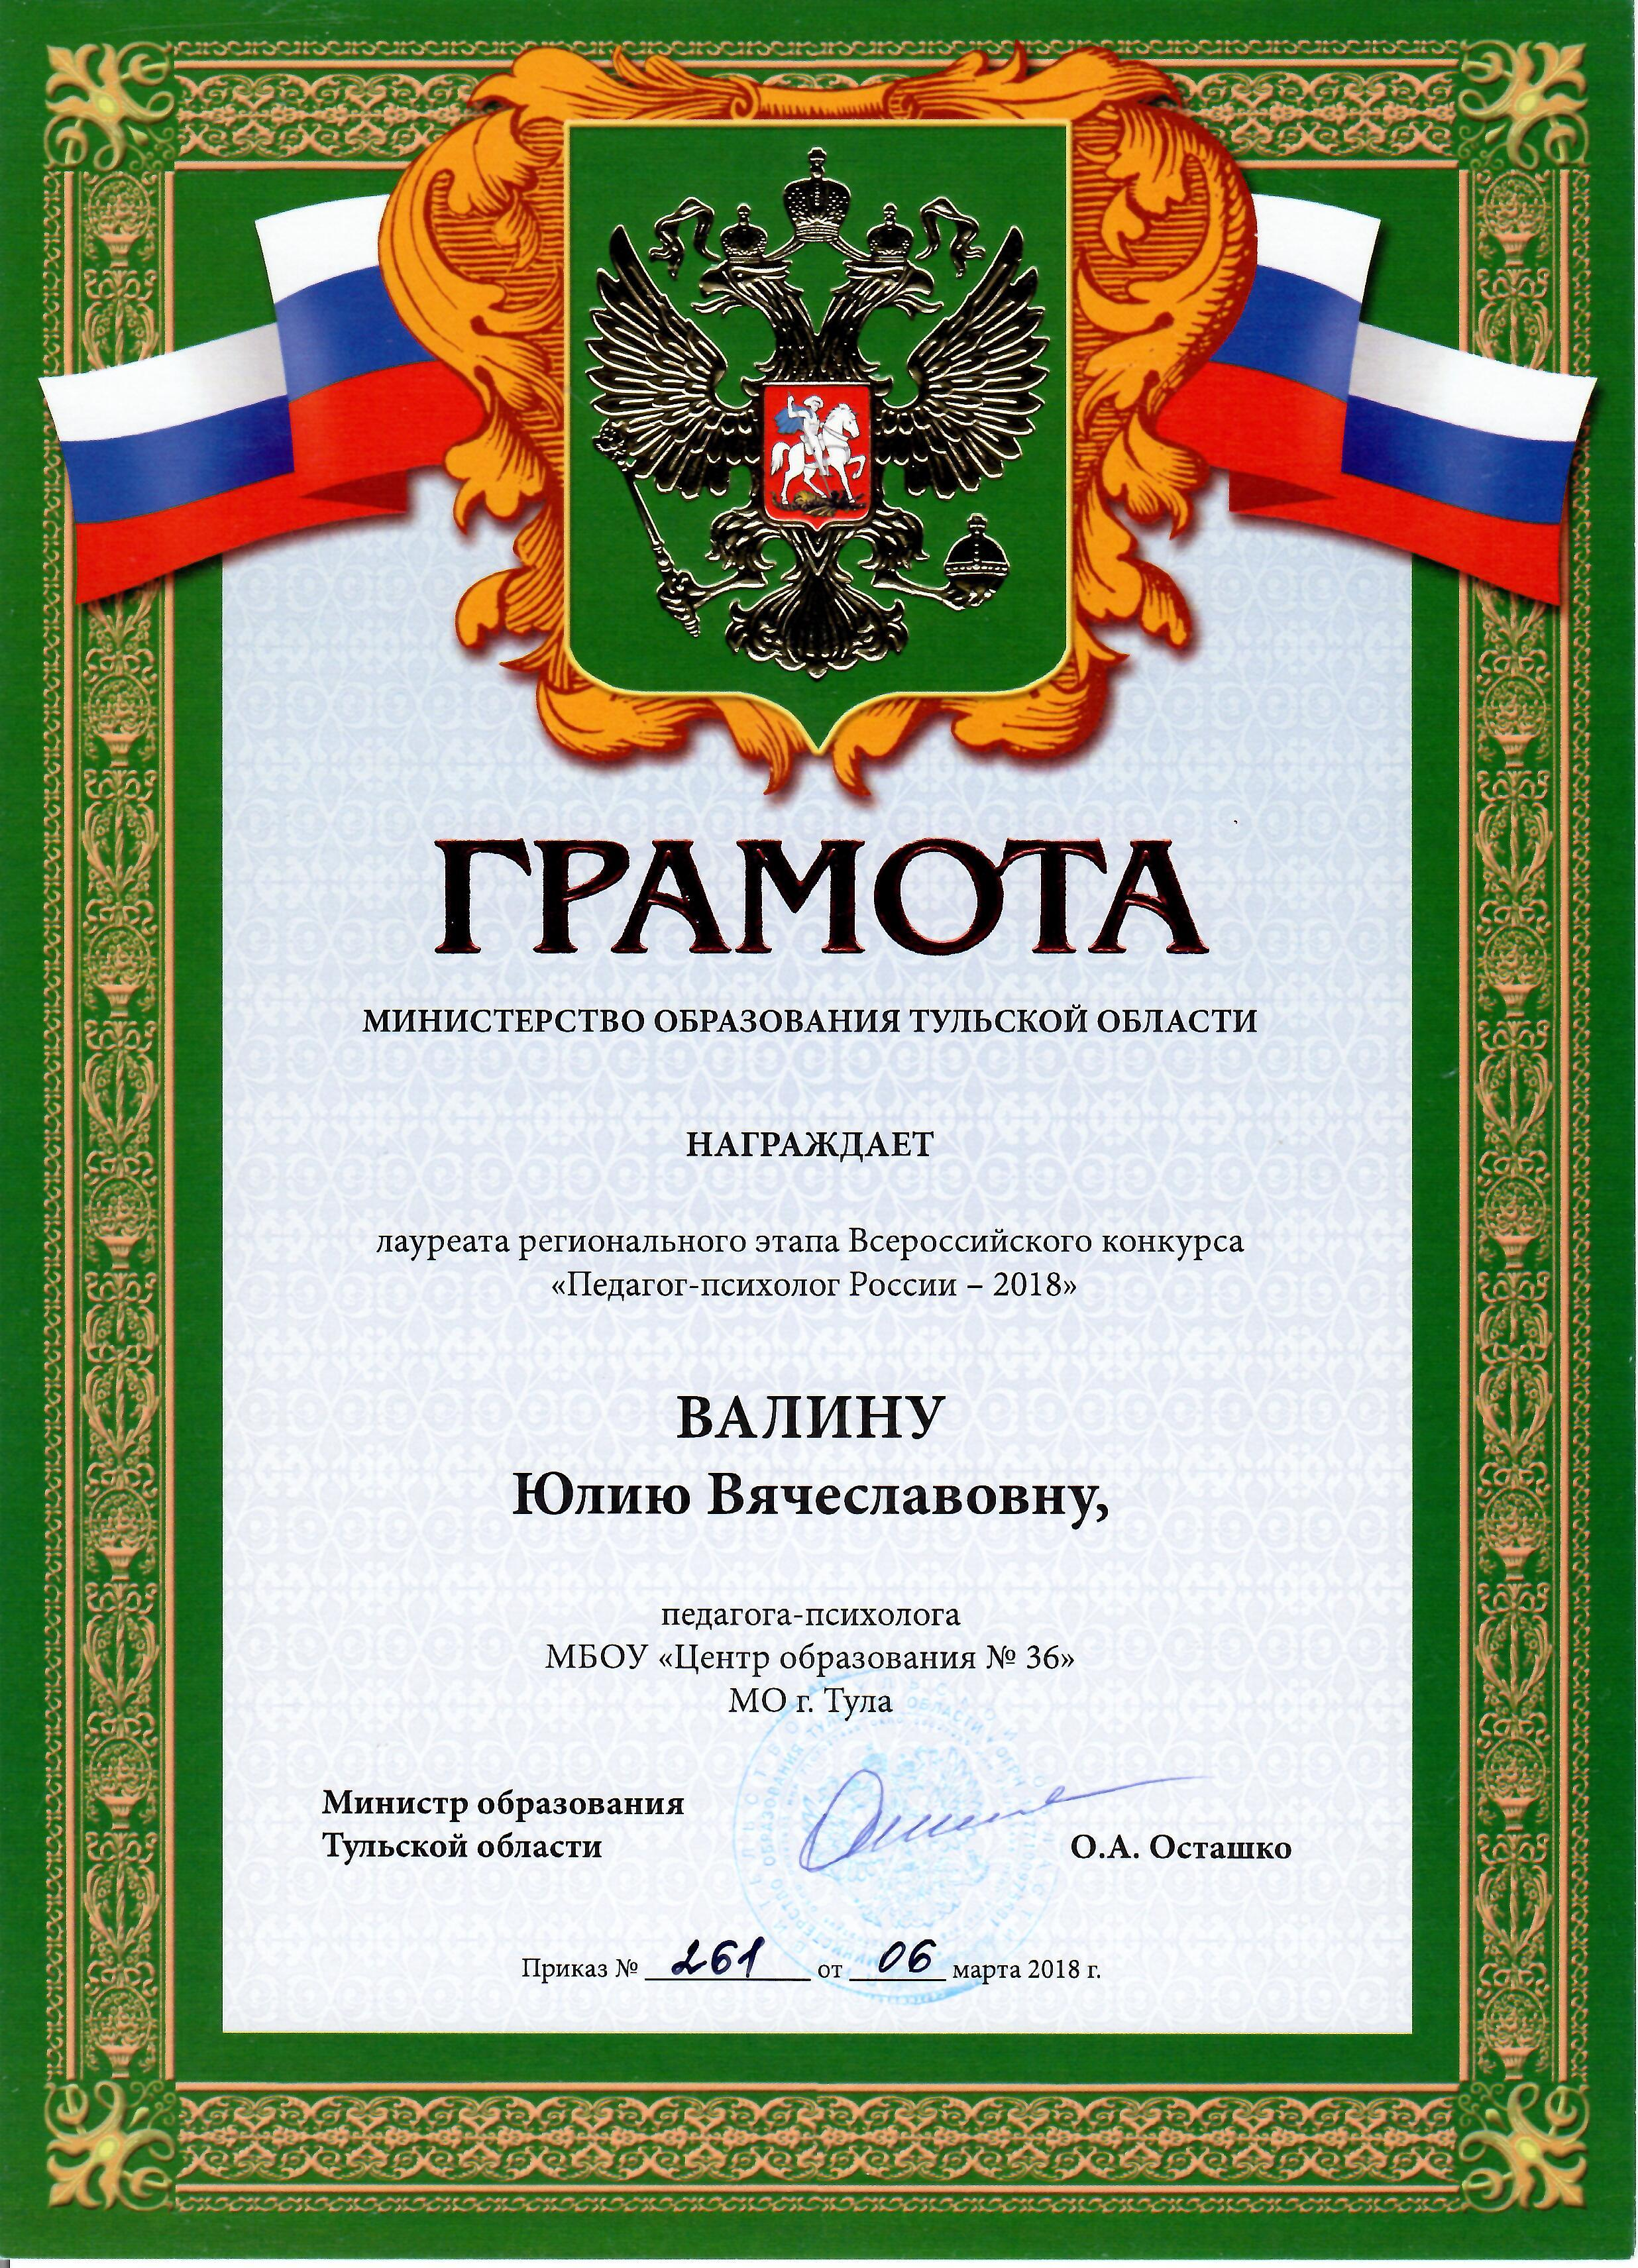 Грамота лауреата Валиной Ю.В.